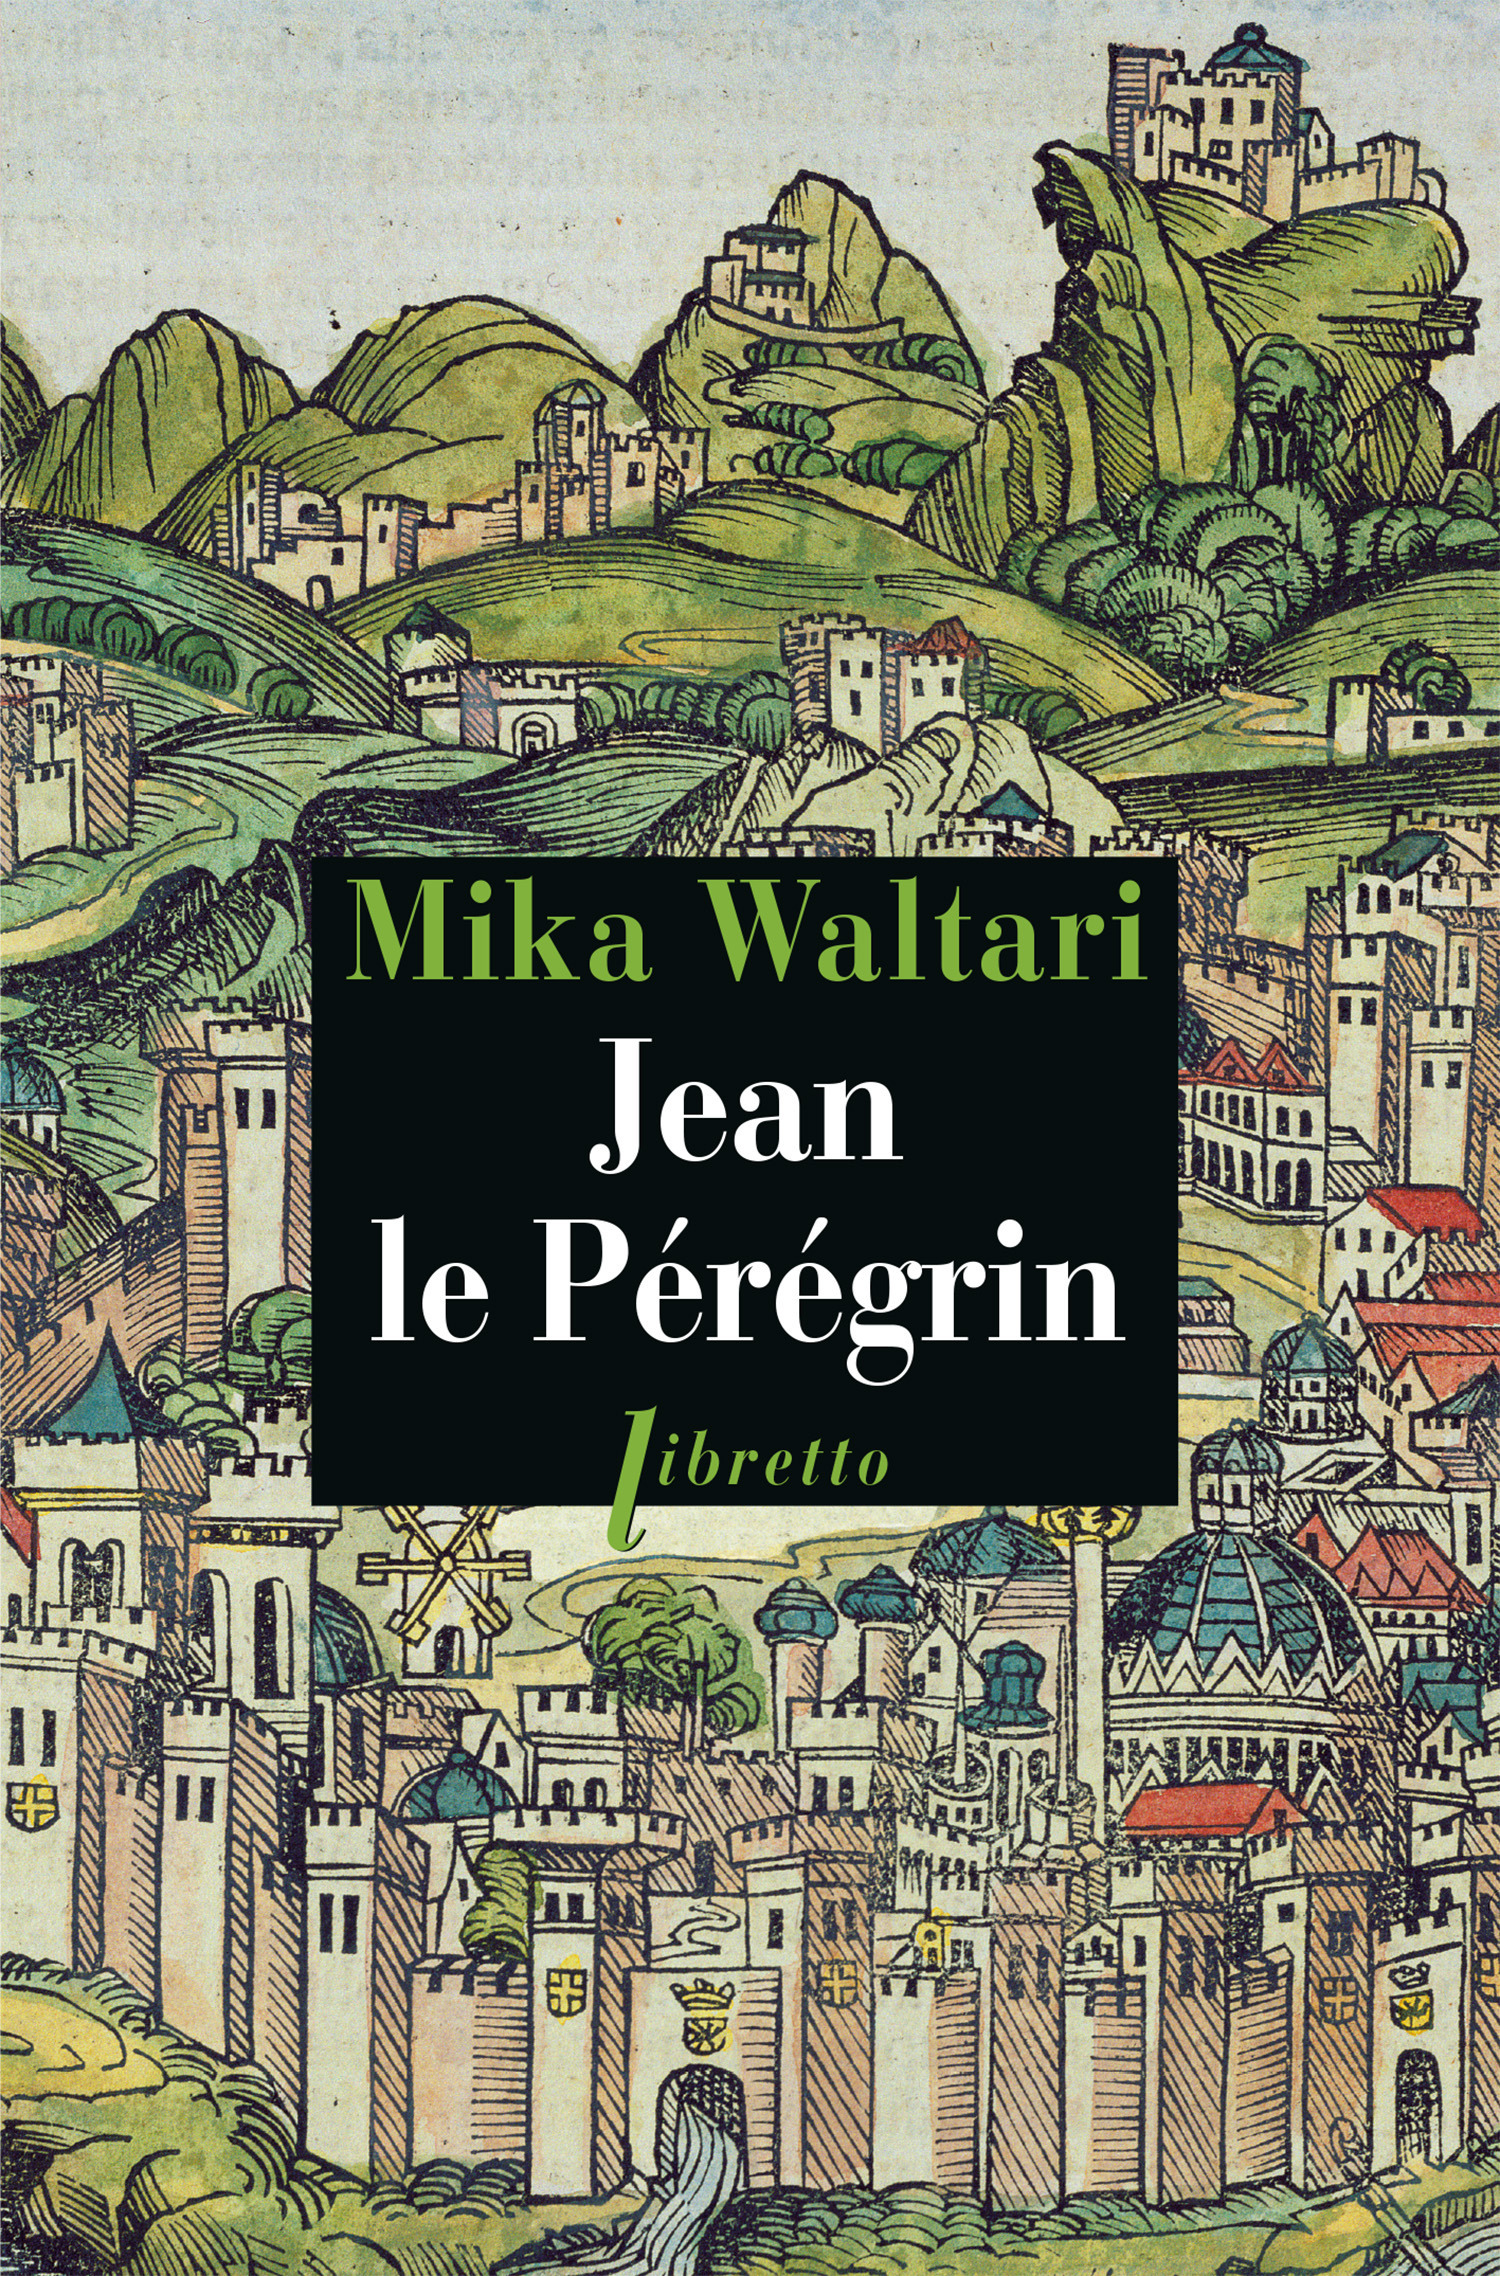 Mika Waltari Jean le Pérégrin